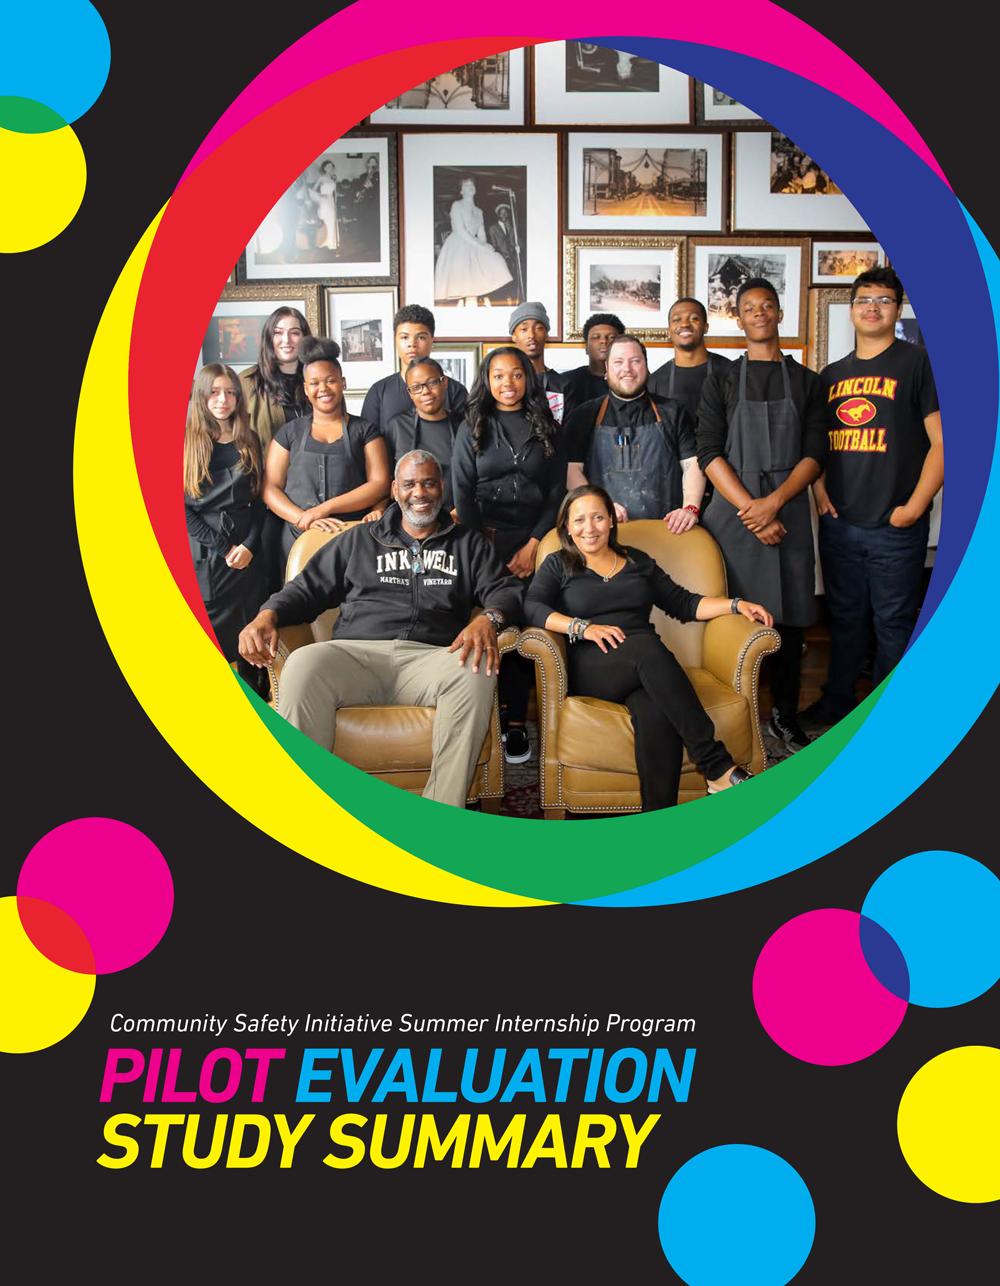 CSI Summer Internship Program - Pilot Evaluation Report